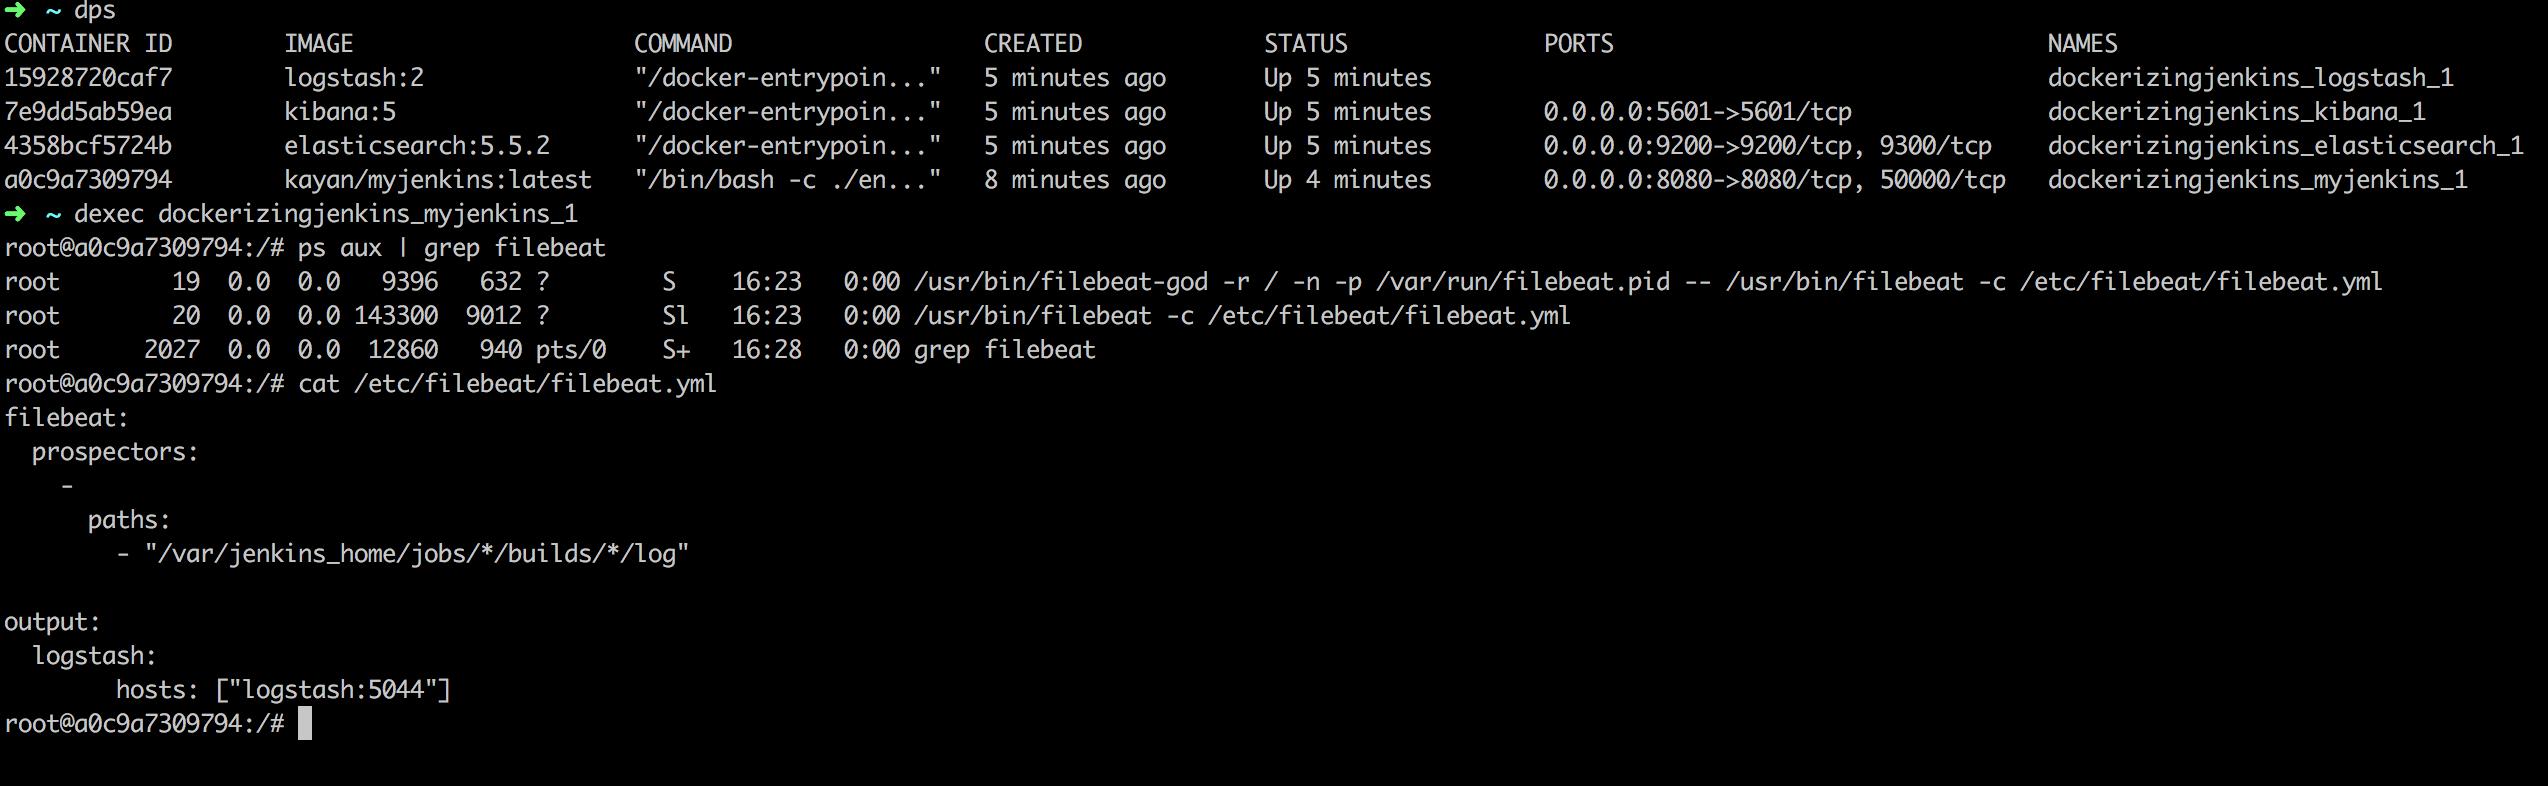 Putting Jenkins Build Logs Into Dockerized ELK Stack - DZone